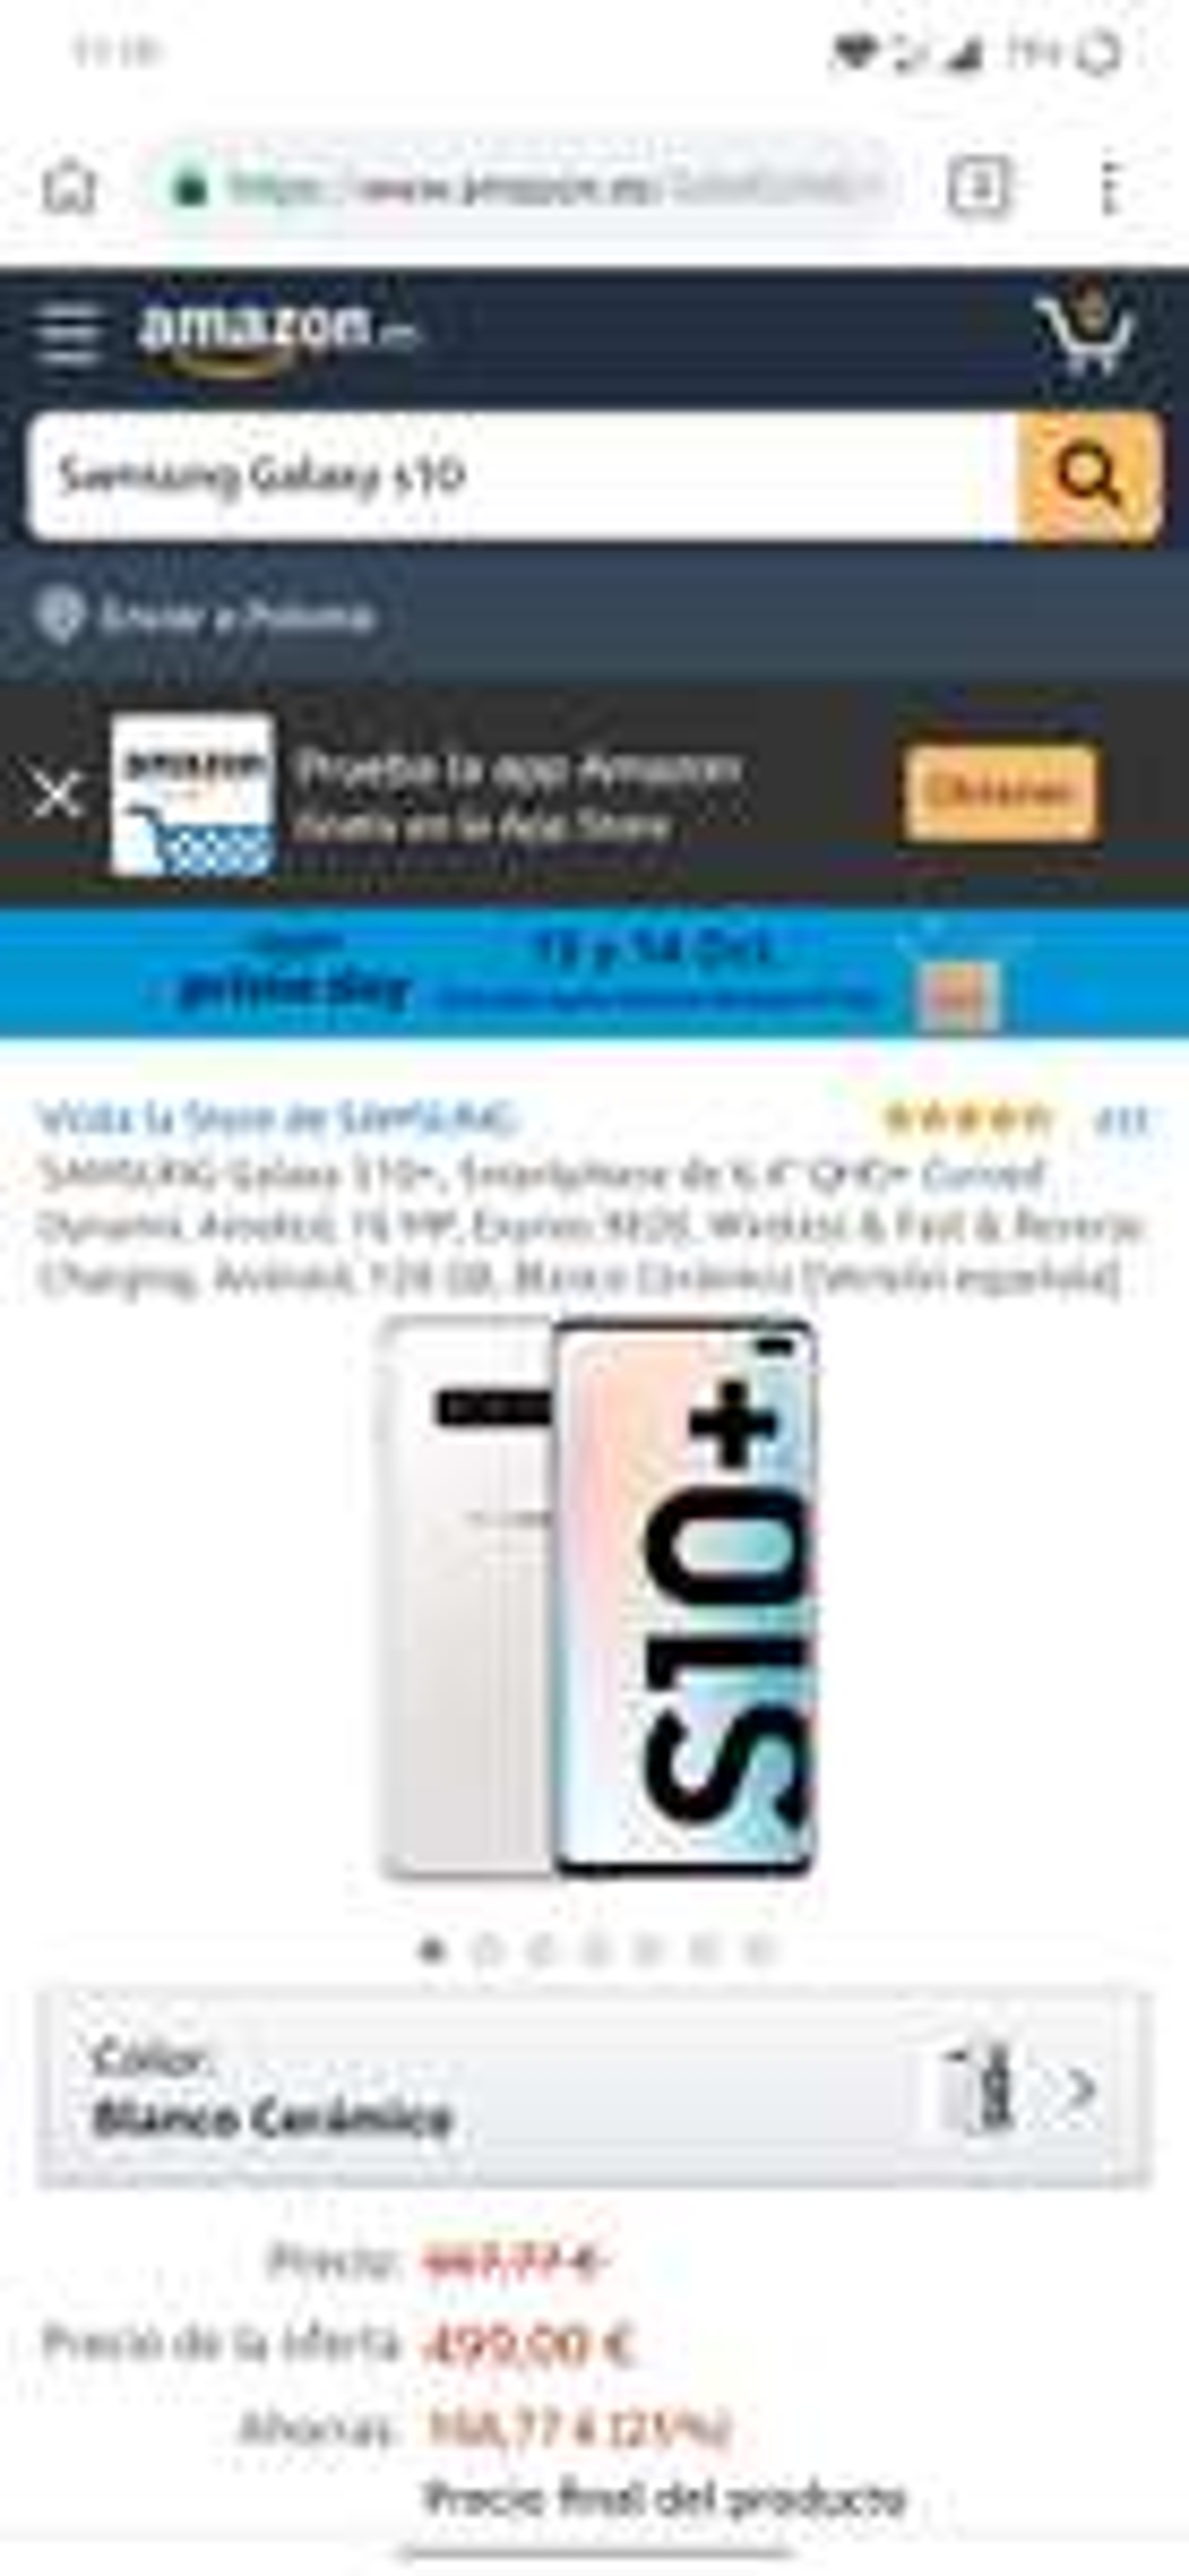 Samsung Galaxy s10+ 499euro (prime)